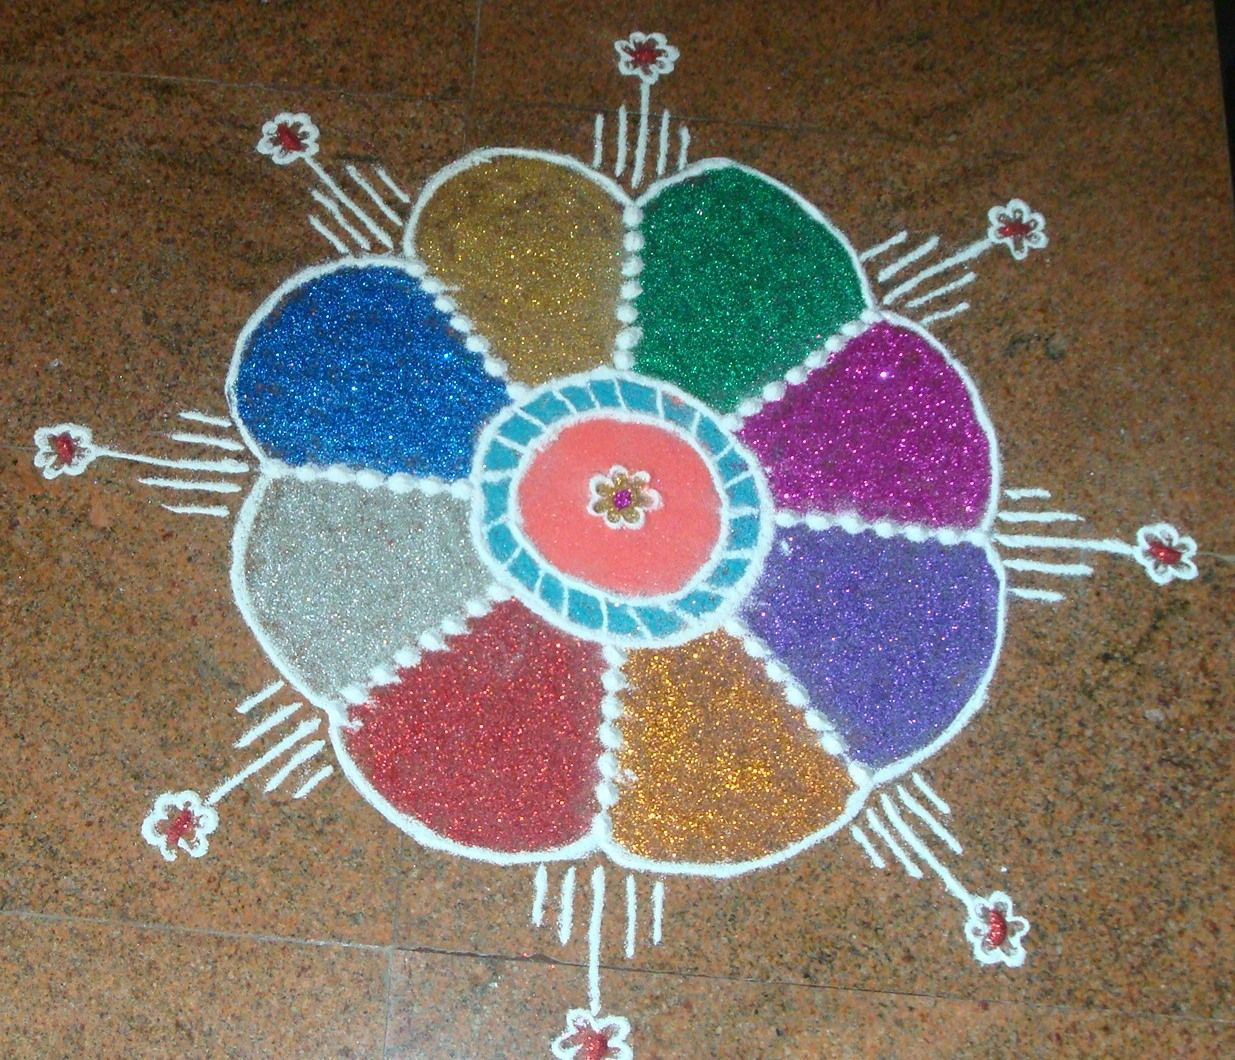 Rangoli Designs - Most Easy Ones | Simple rangoli and Rangoli designs for Simple Rangoli Designs For Diwali With Flowers  143gtk